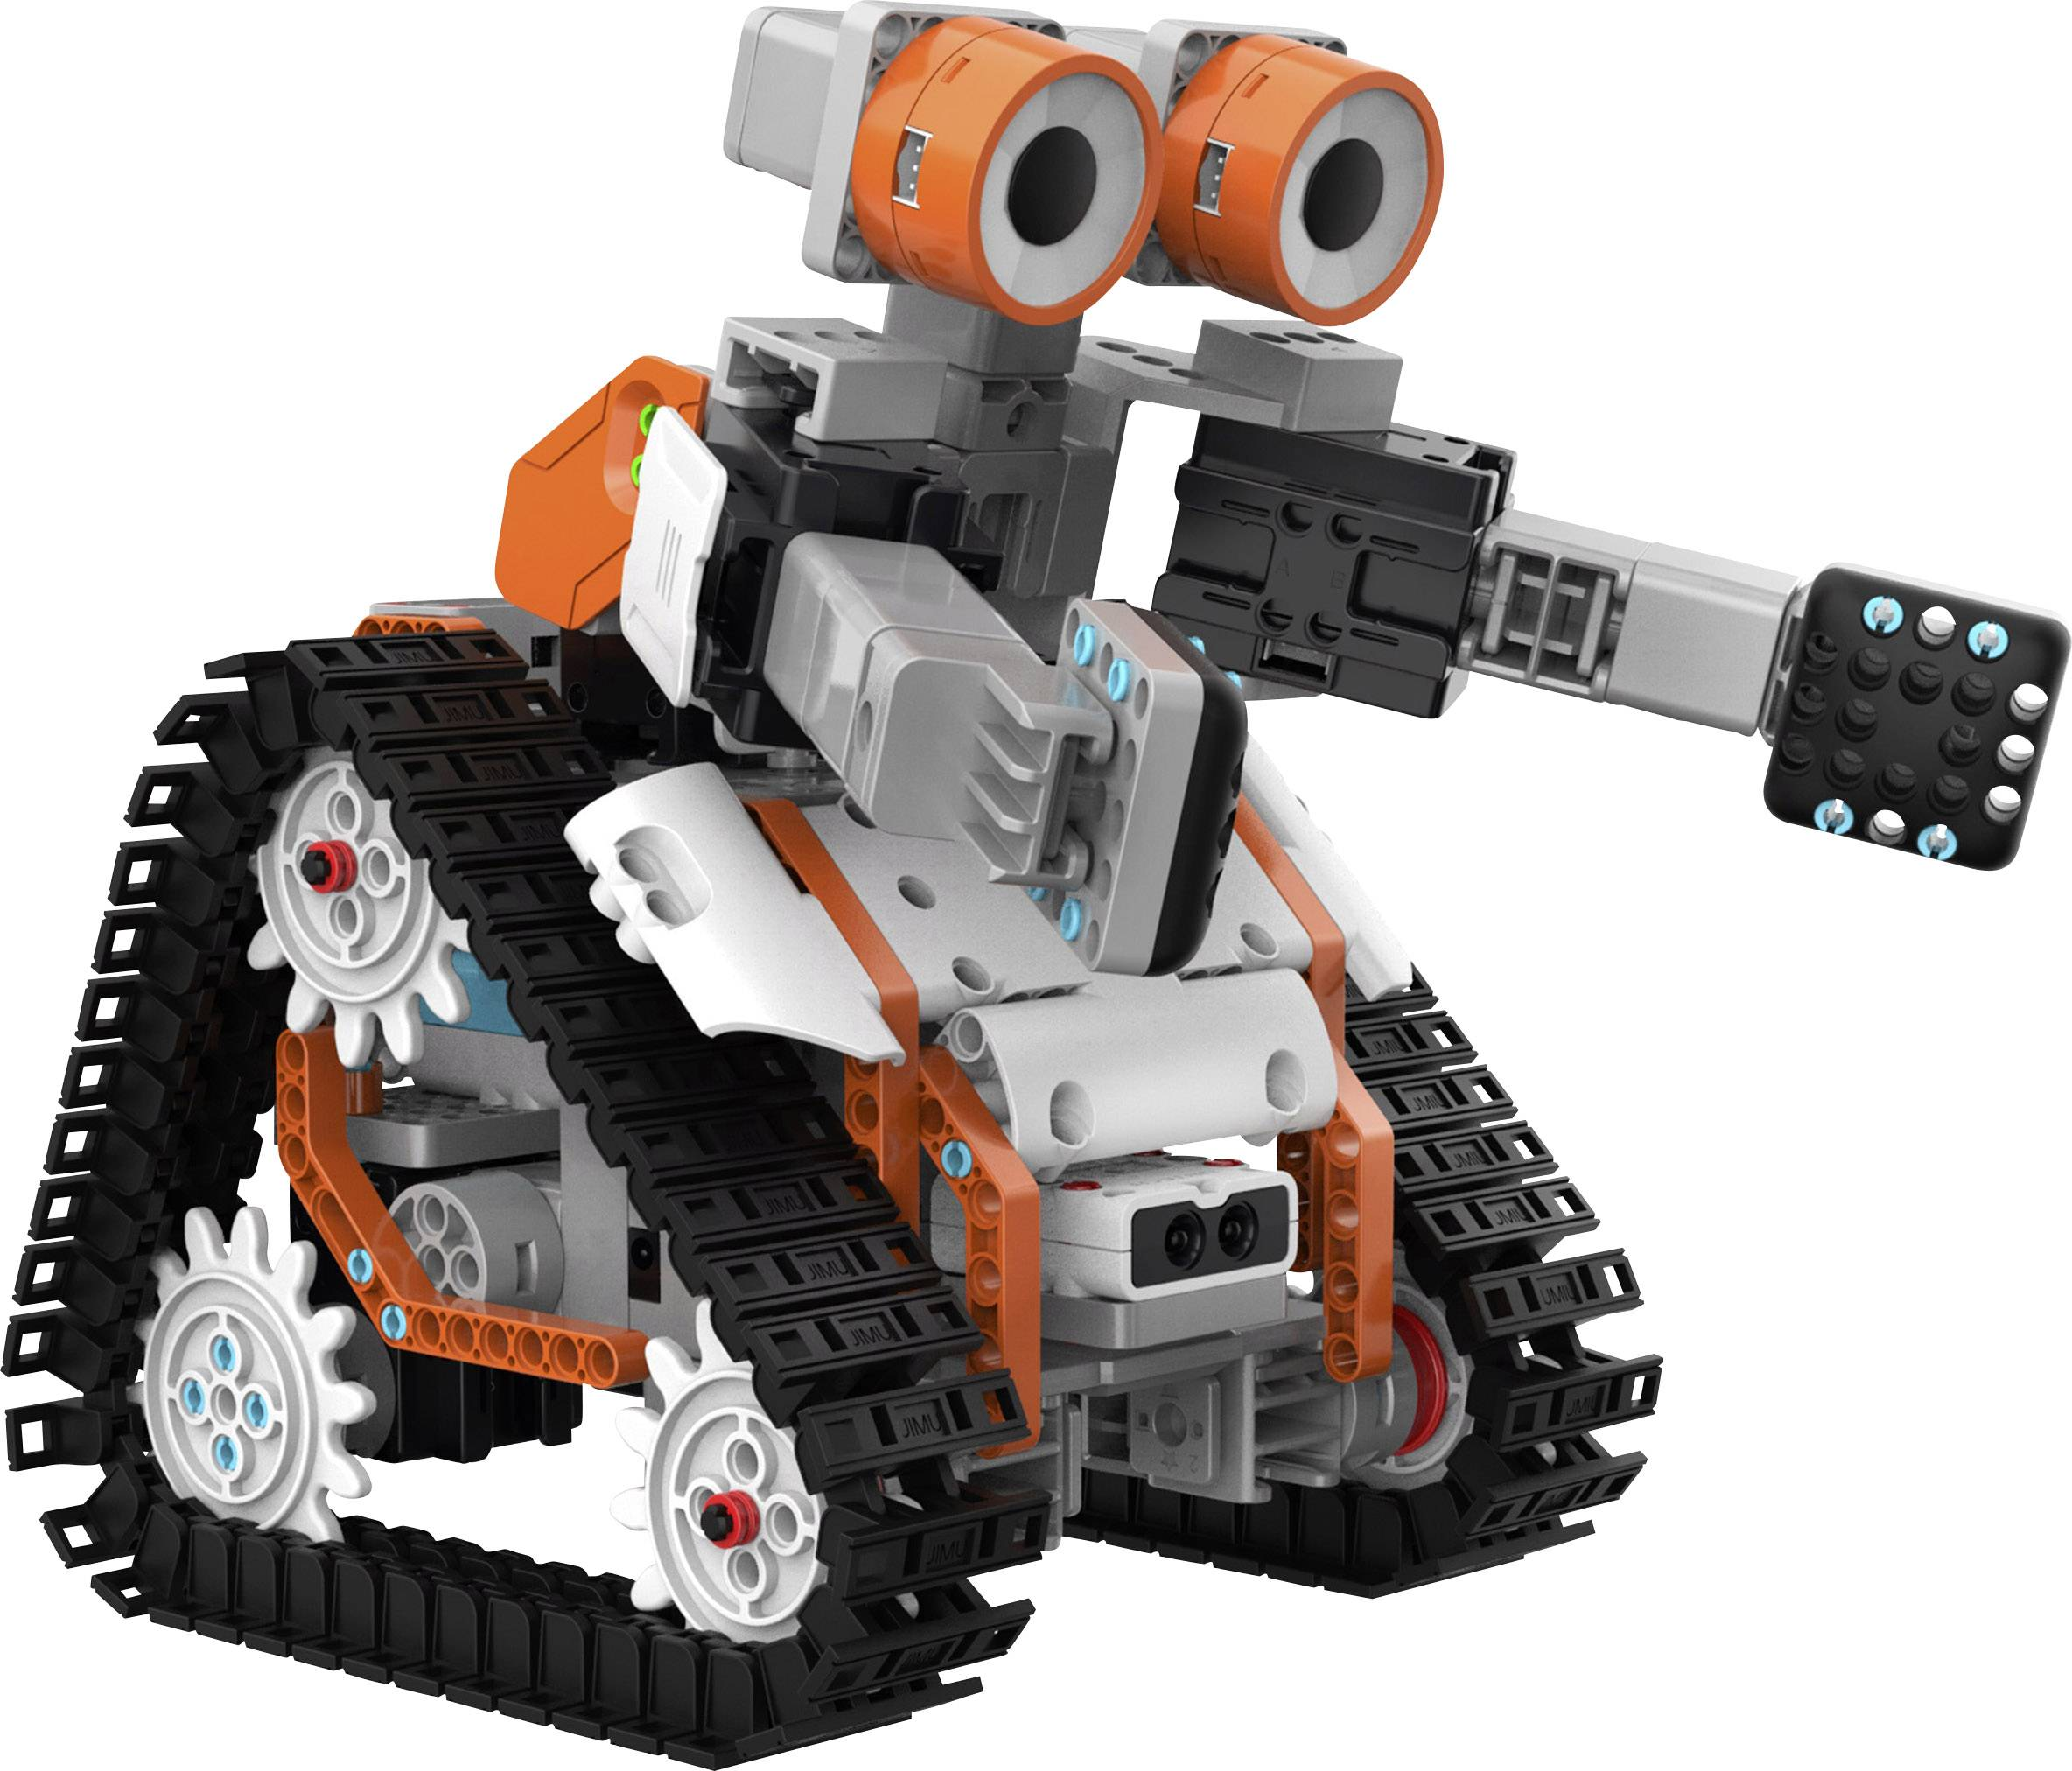 Stavebnica robota Ubtech Jimu Robot AstroBot Kit 80689